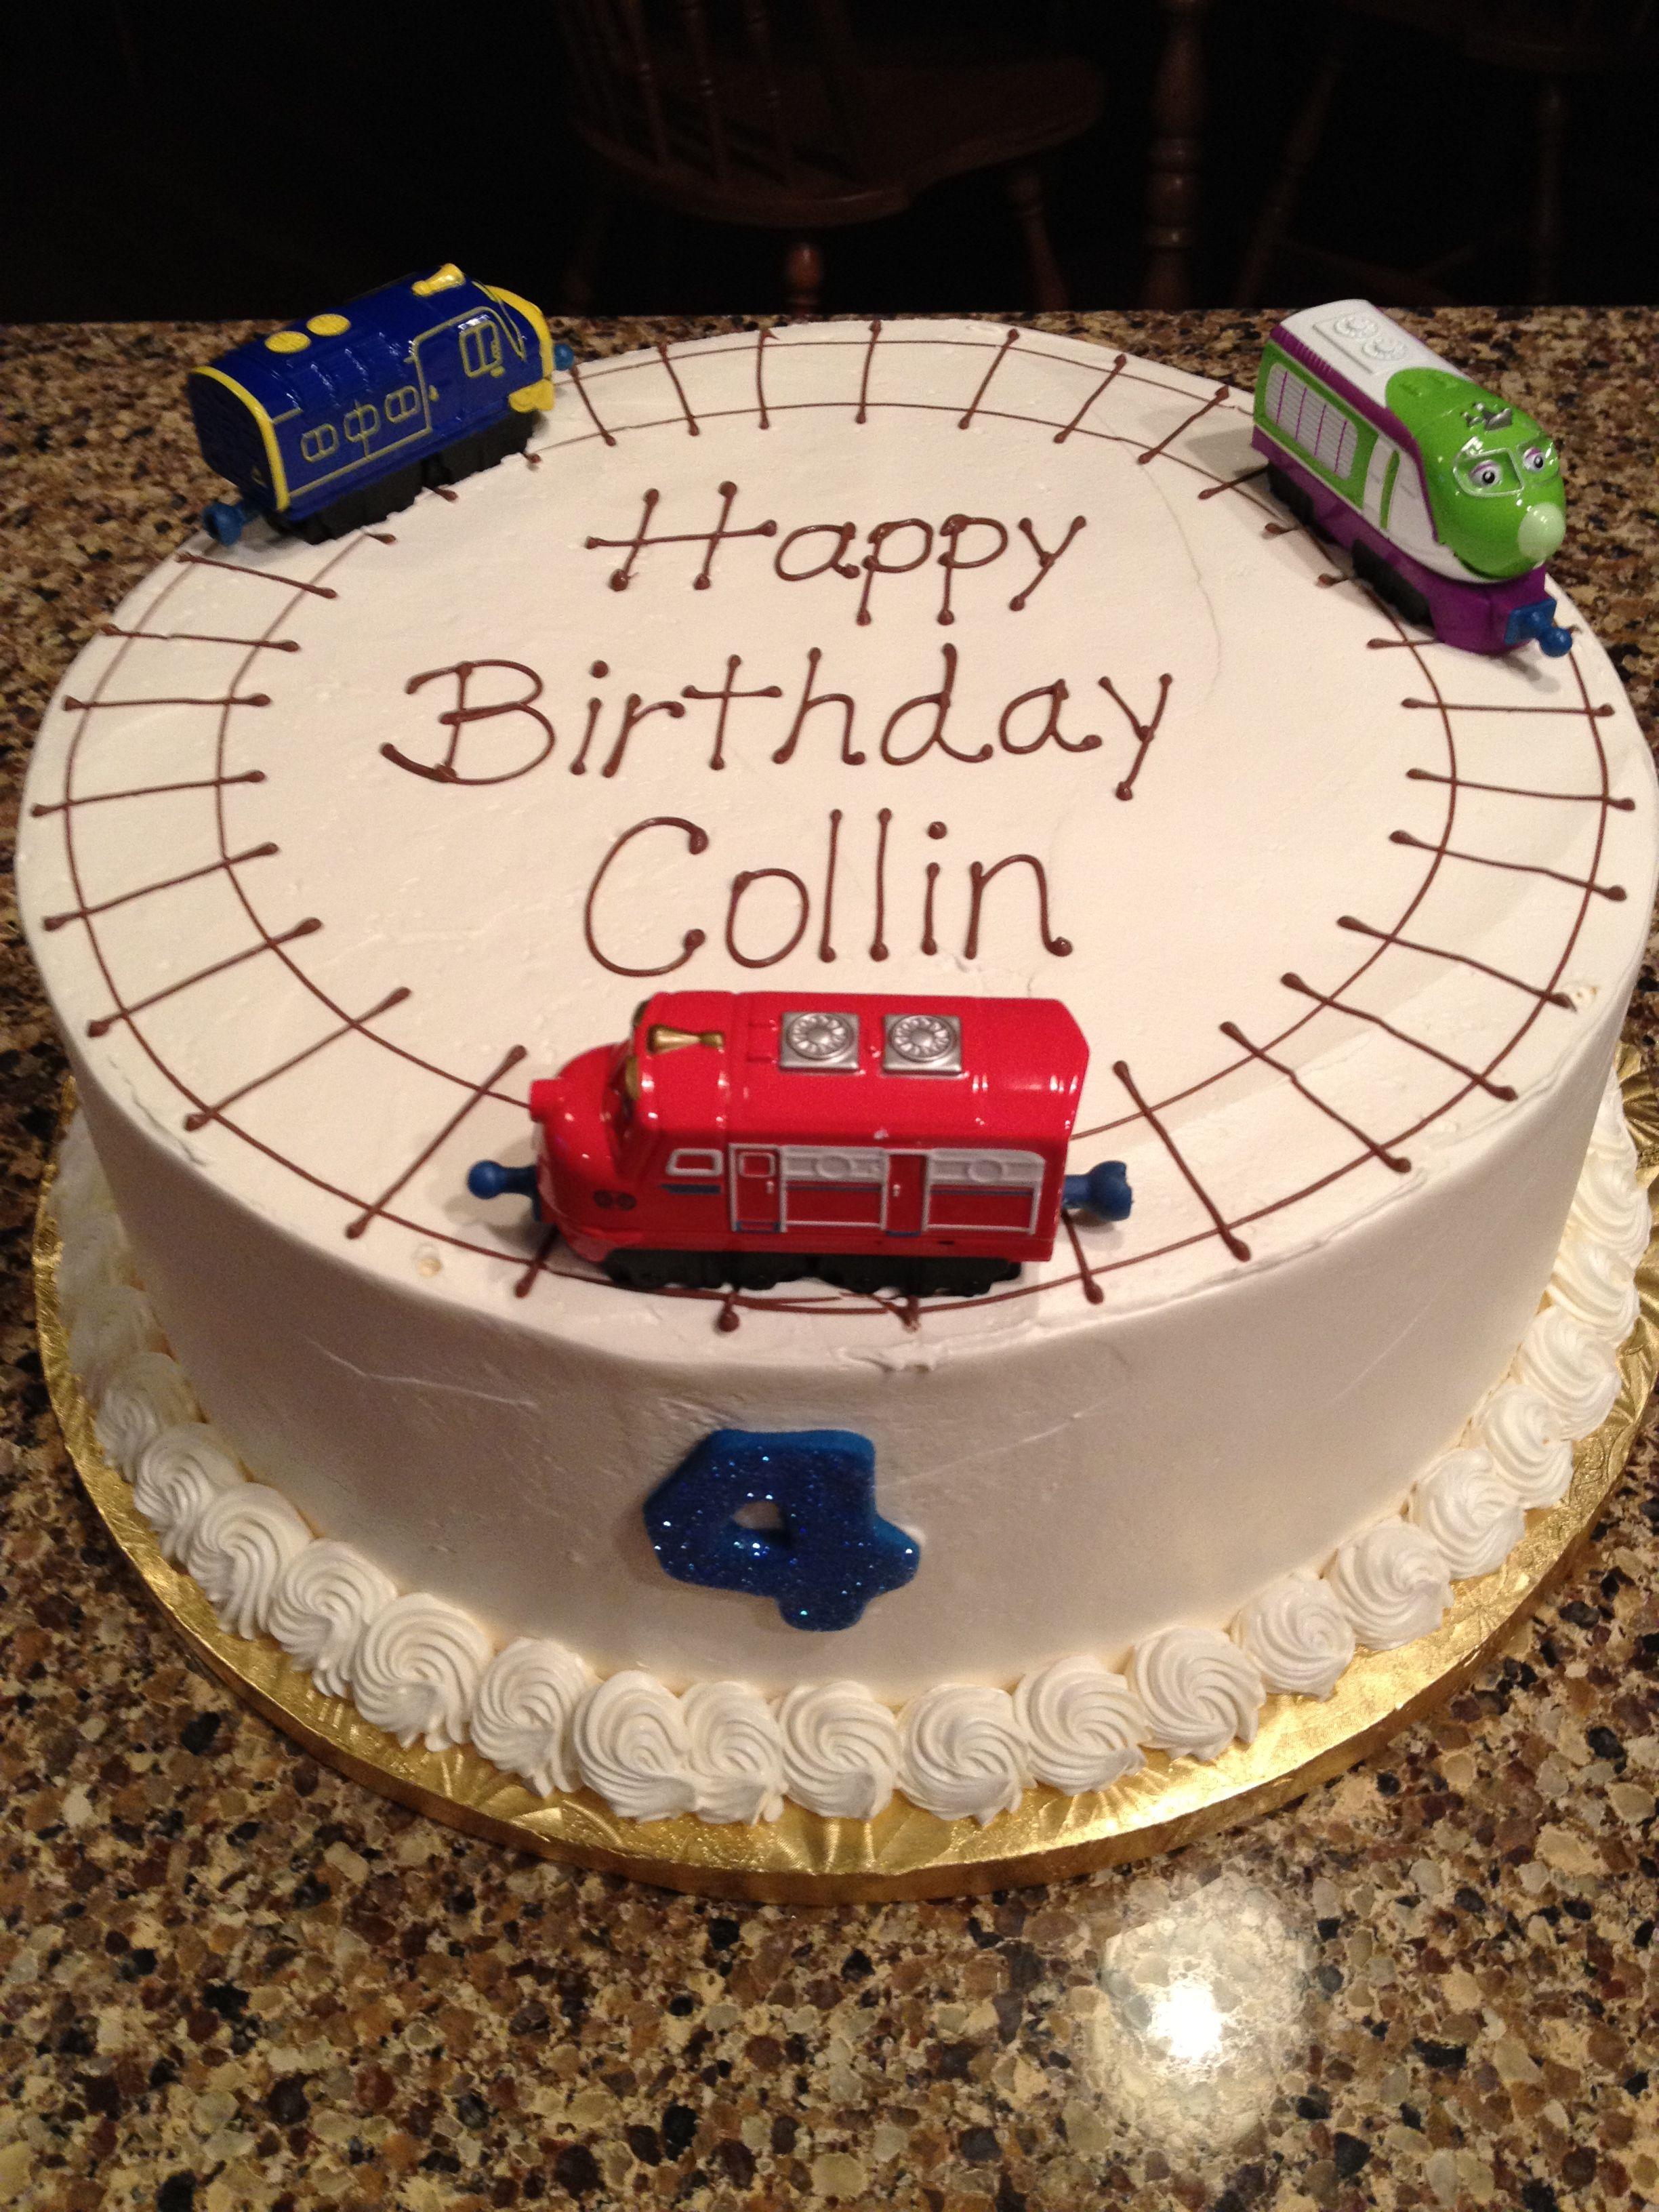 celebration cakes edible personalised name tiles for birthday christening